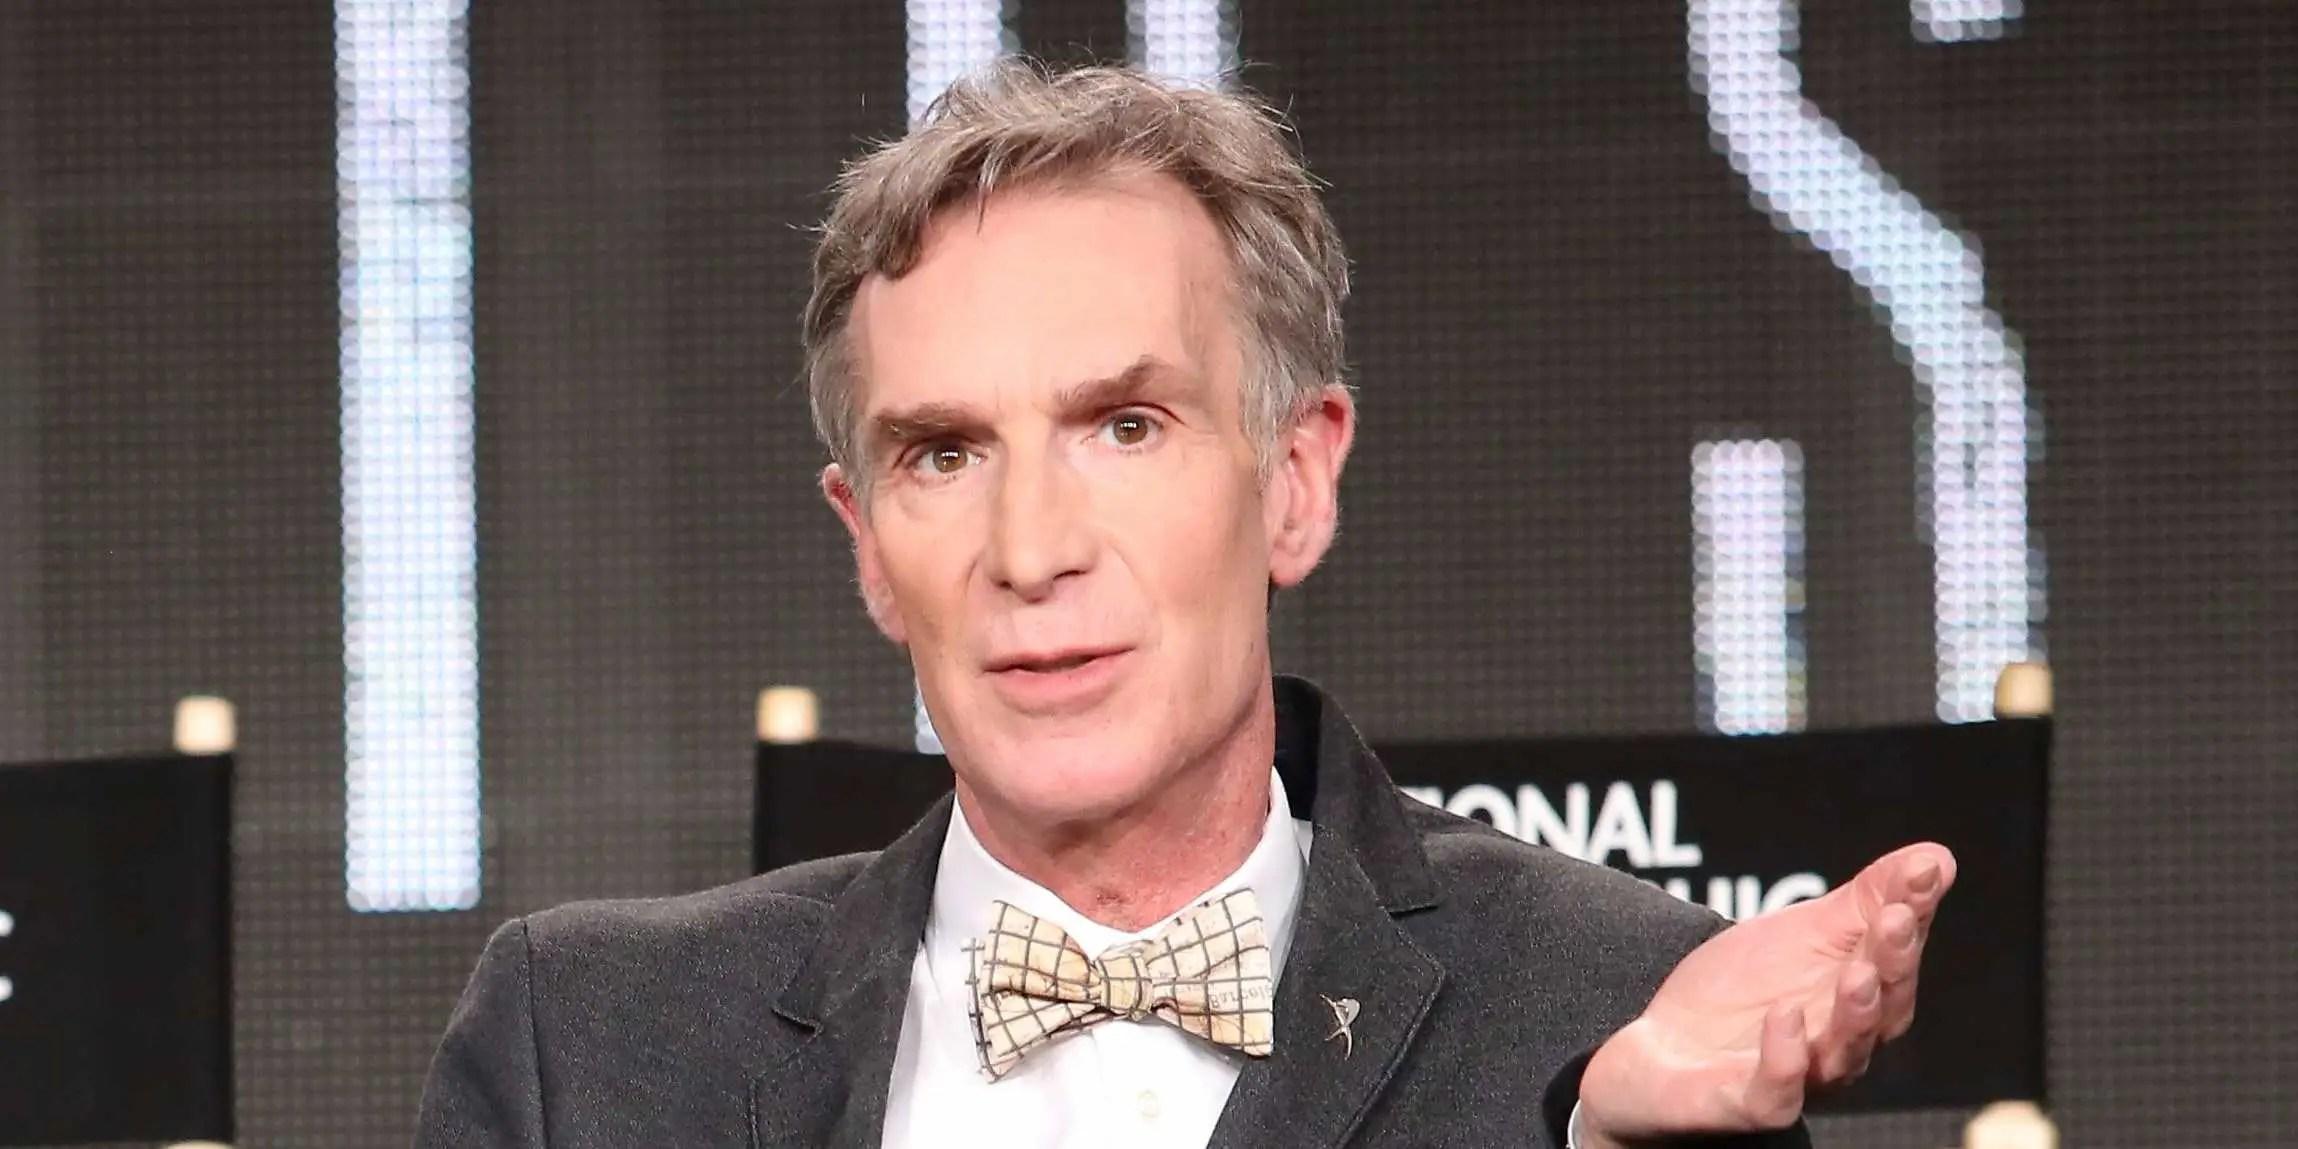 Bill Nye Explains His Stance On Gmos